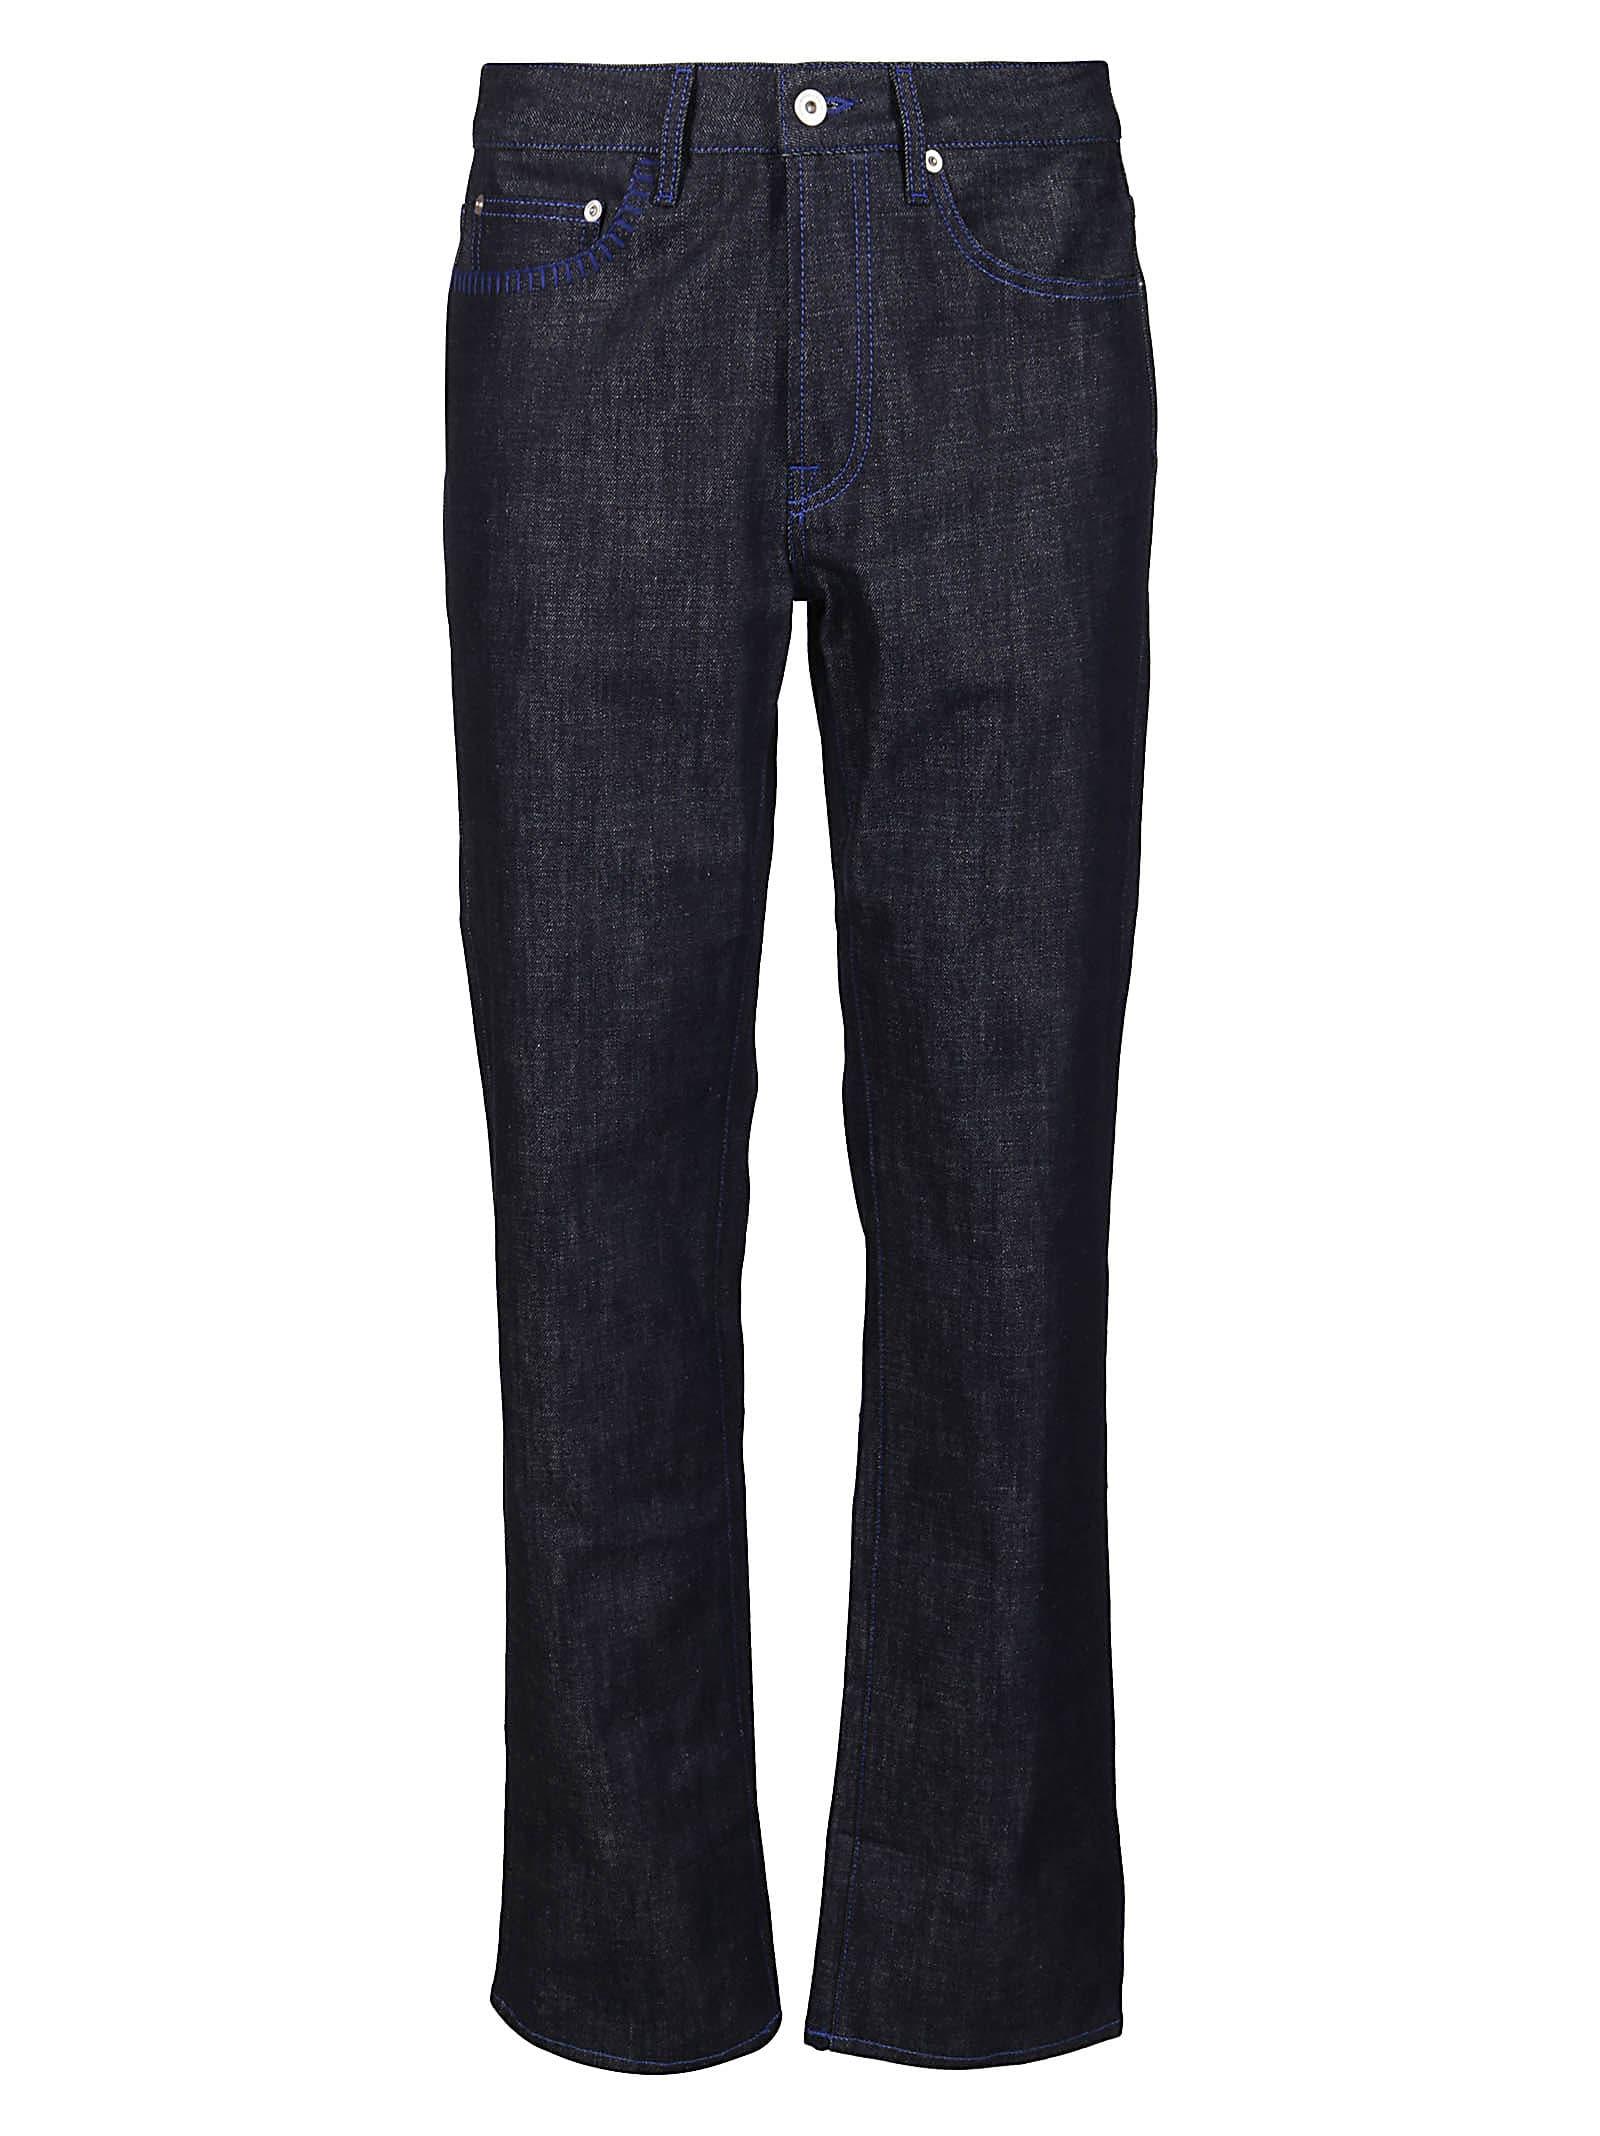 Marcelo Burlon County Of Milan Clothing DARK BLUE COTTON BLEND JEANS